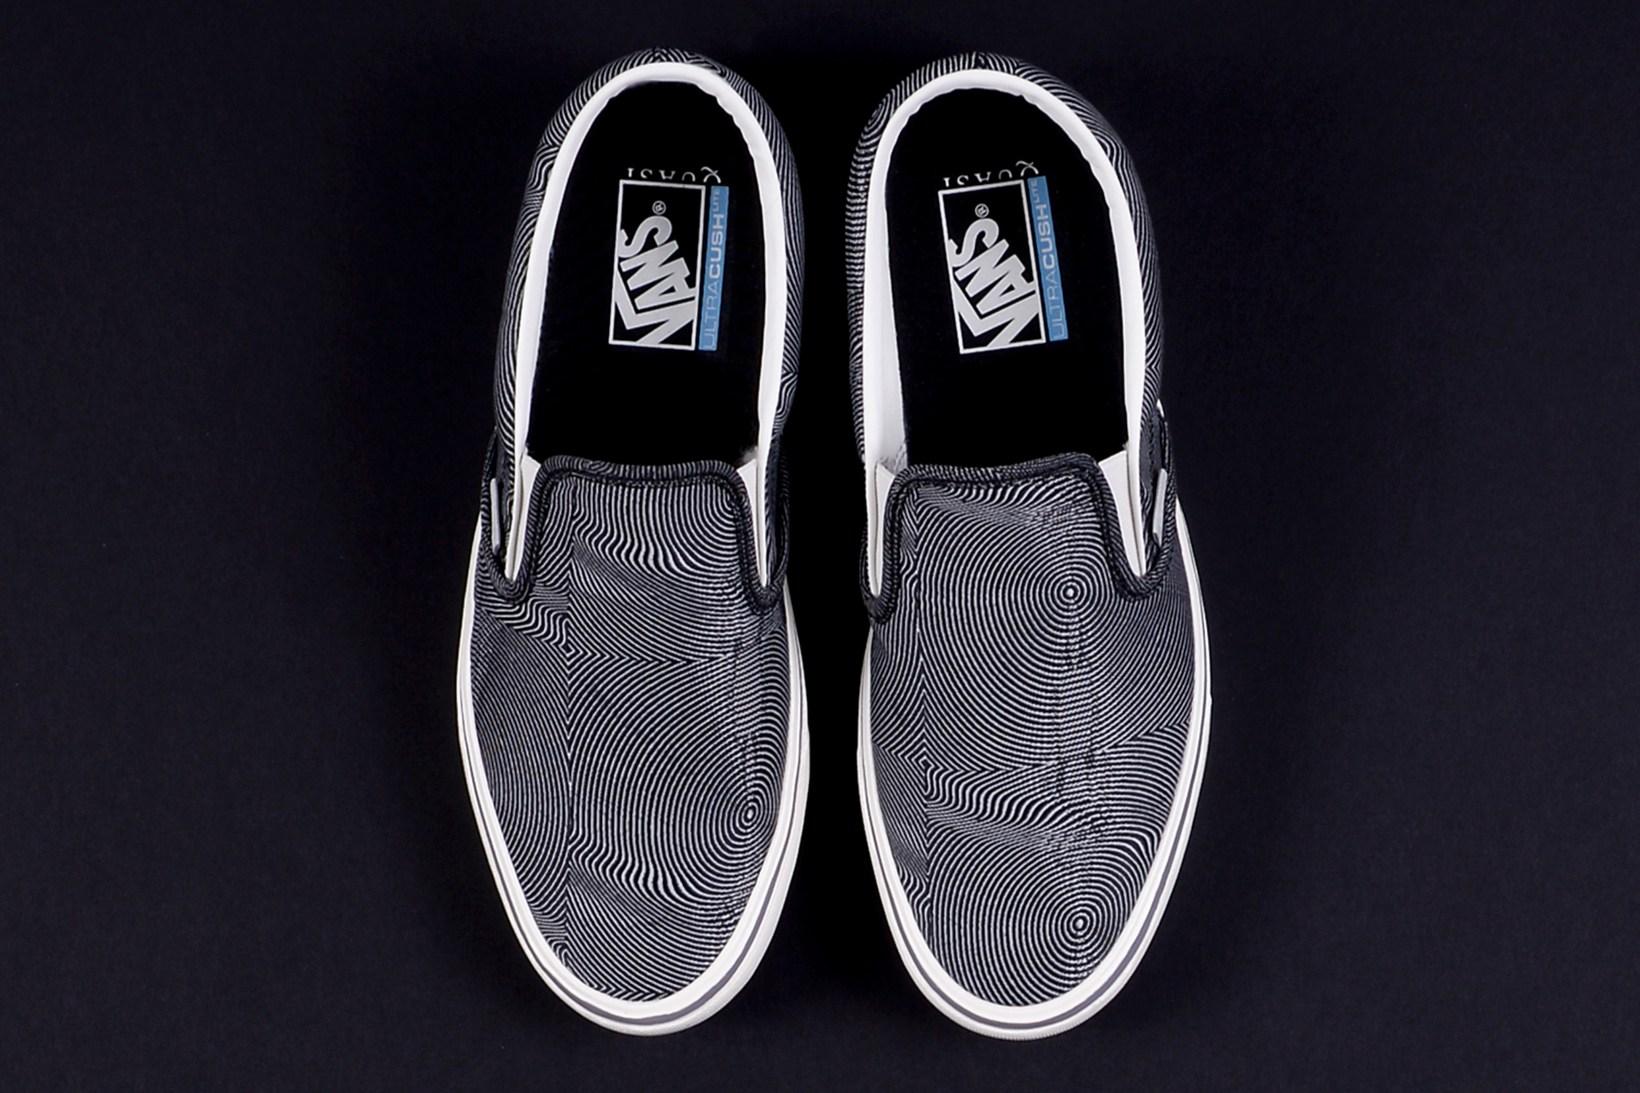 vans-pro-skate-arcad-gilbert-crockett-quasi-skateboards-2